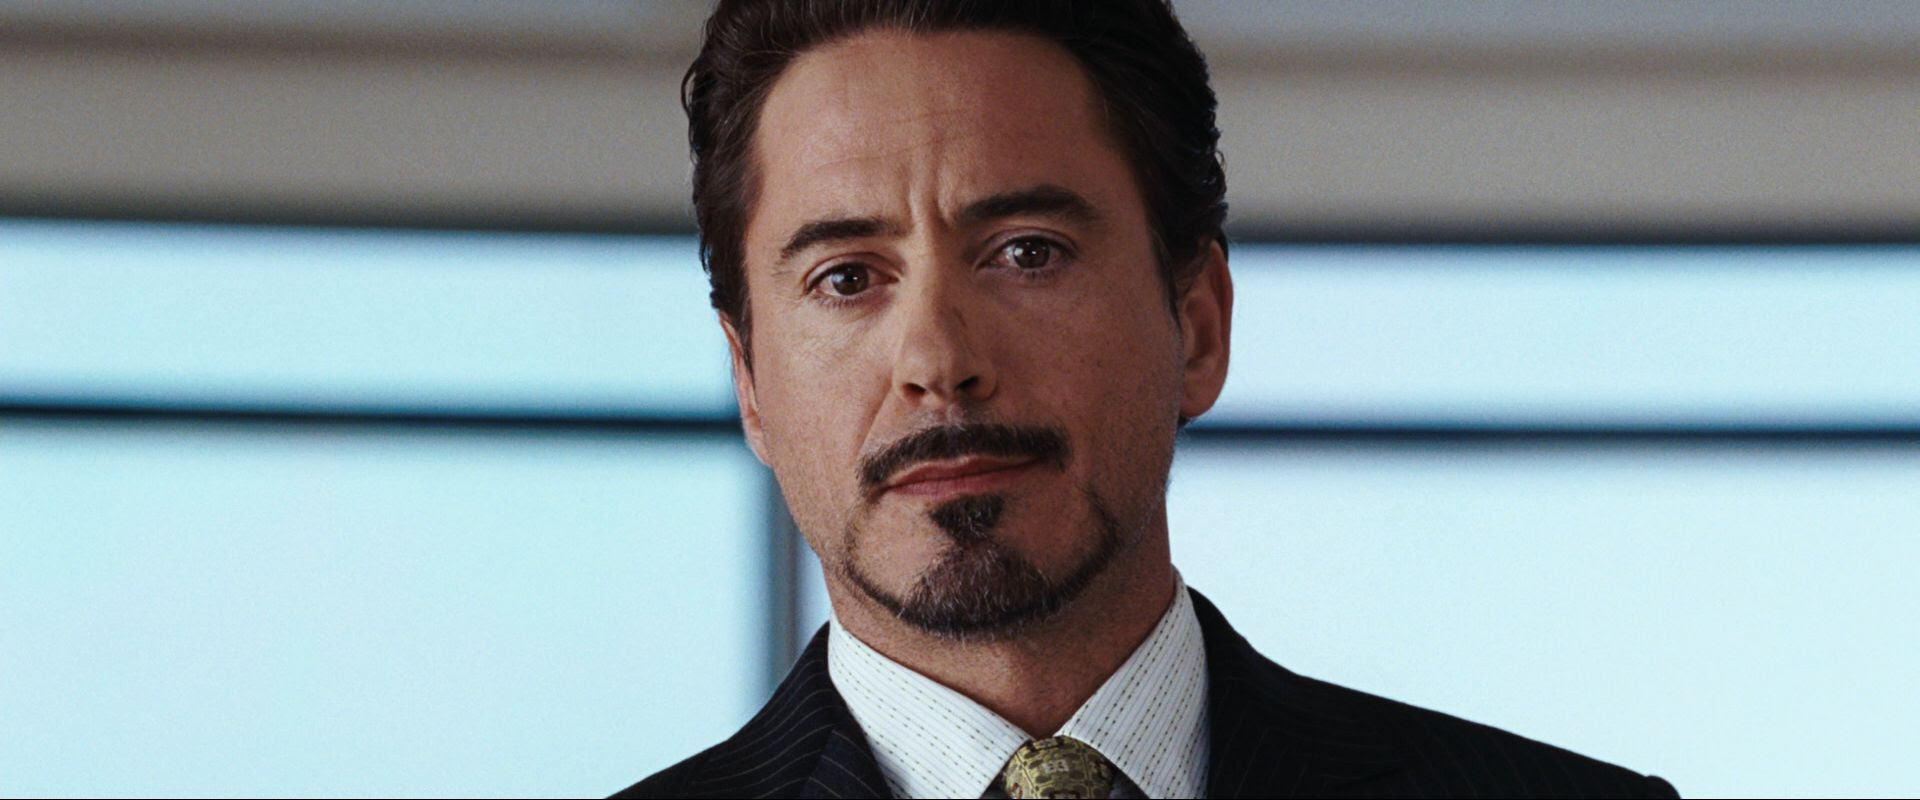 Pictures Of Tony Stark Beard Style Great Iron Man Pics